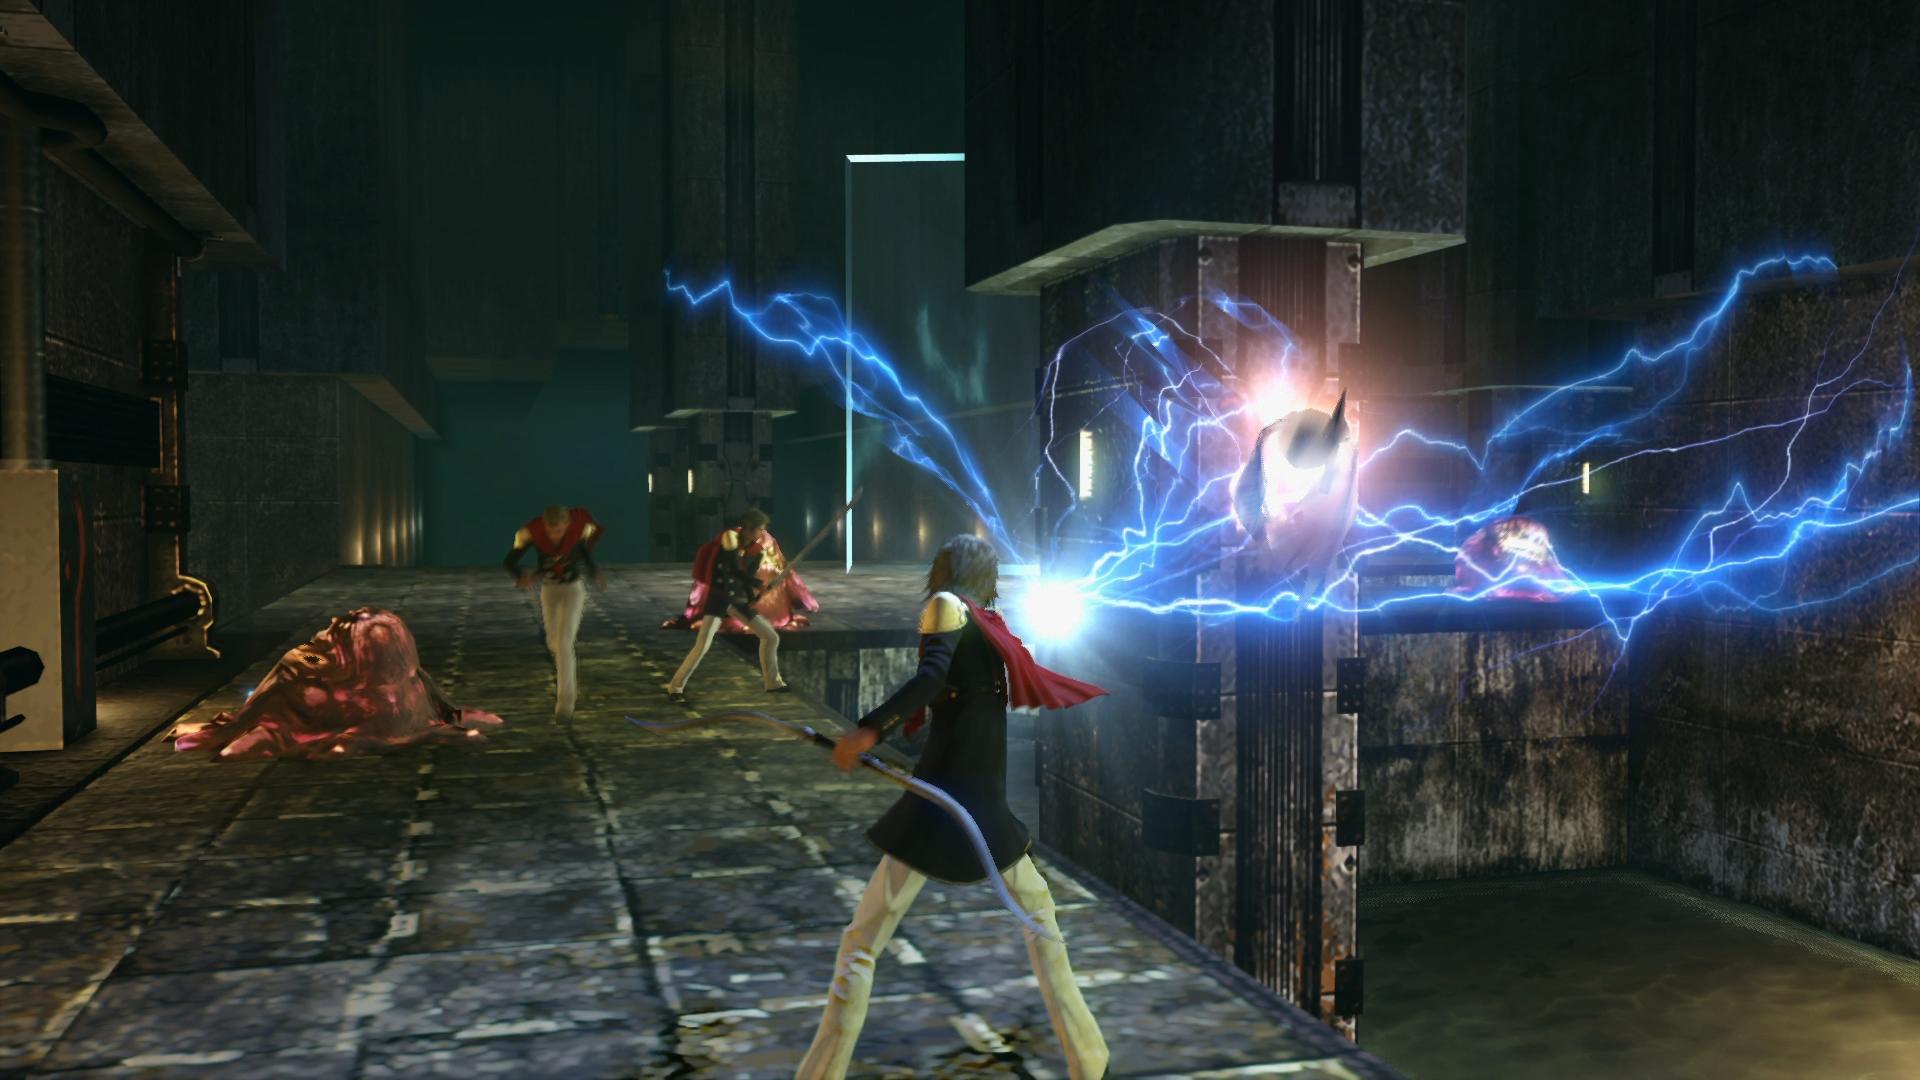 Final Fantasy Type 0 Hd Games 4k Wallpapers Images: New Final Fantasy Type-0 HD Screenshots